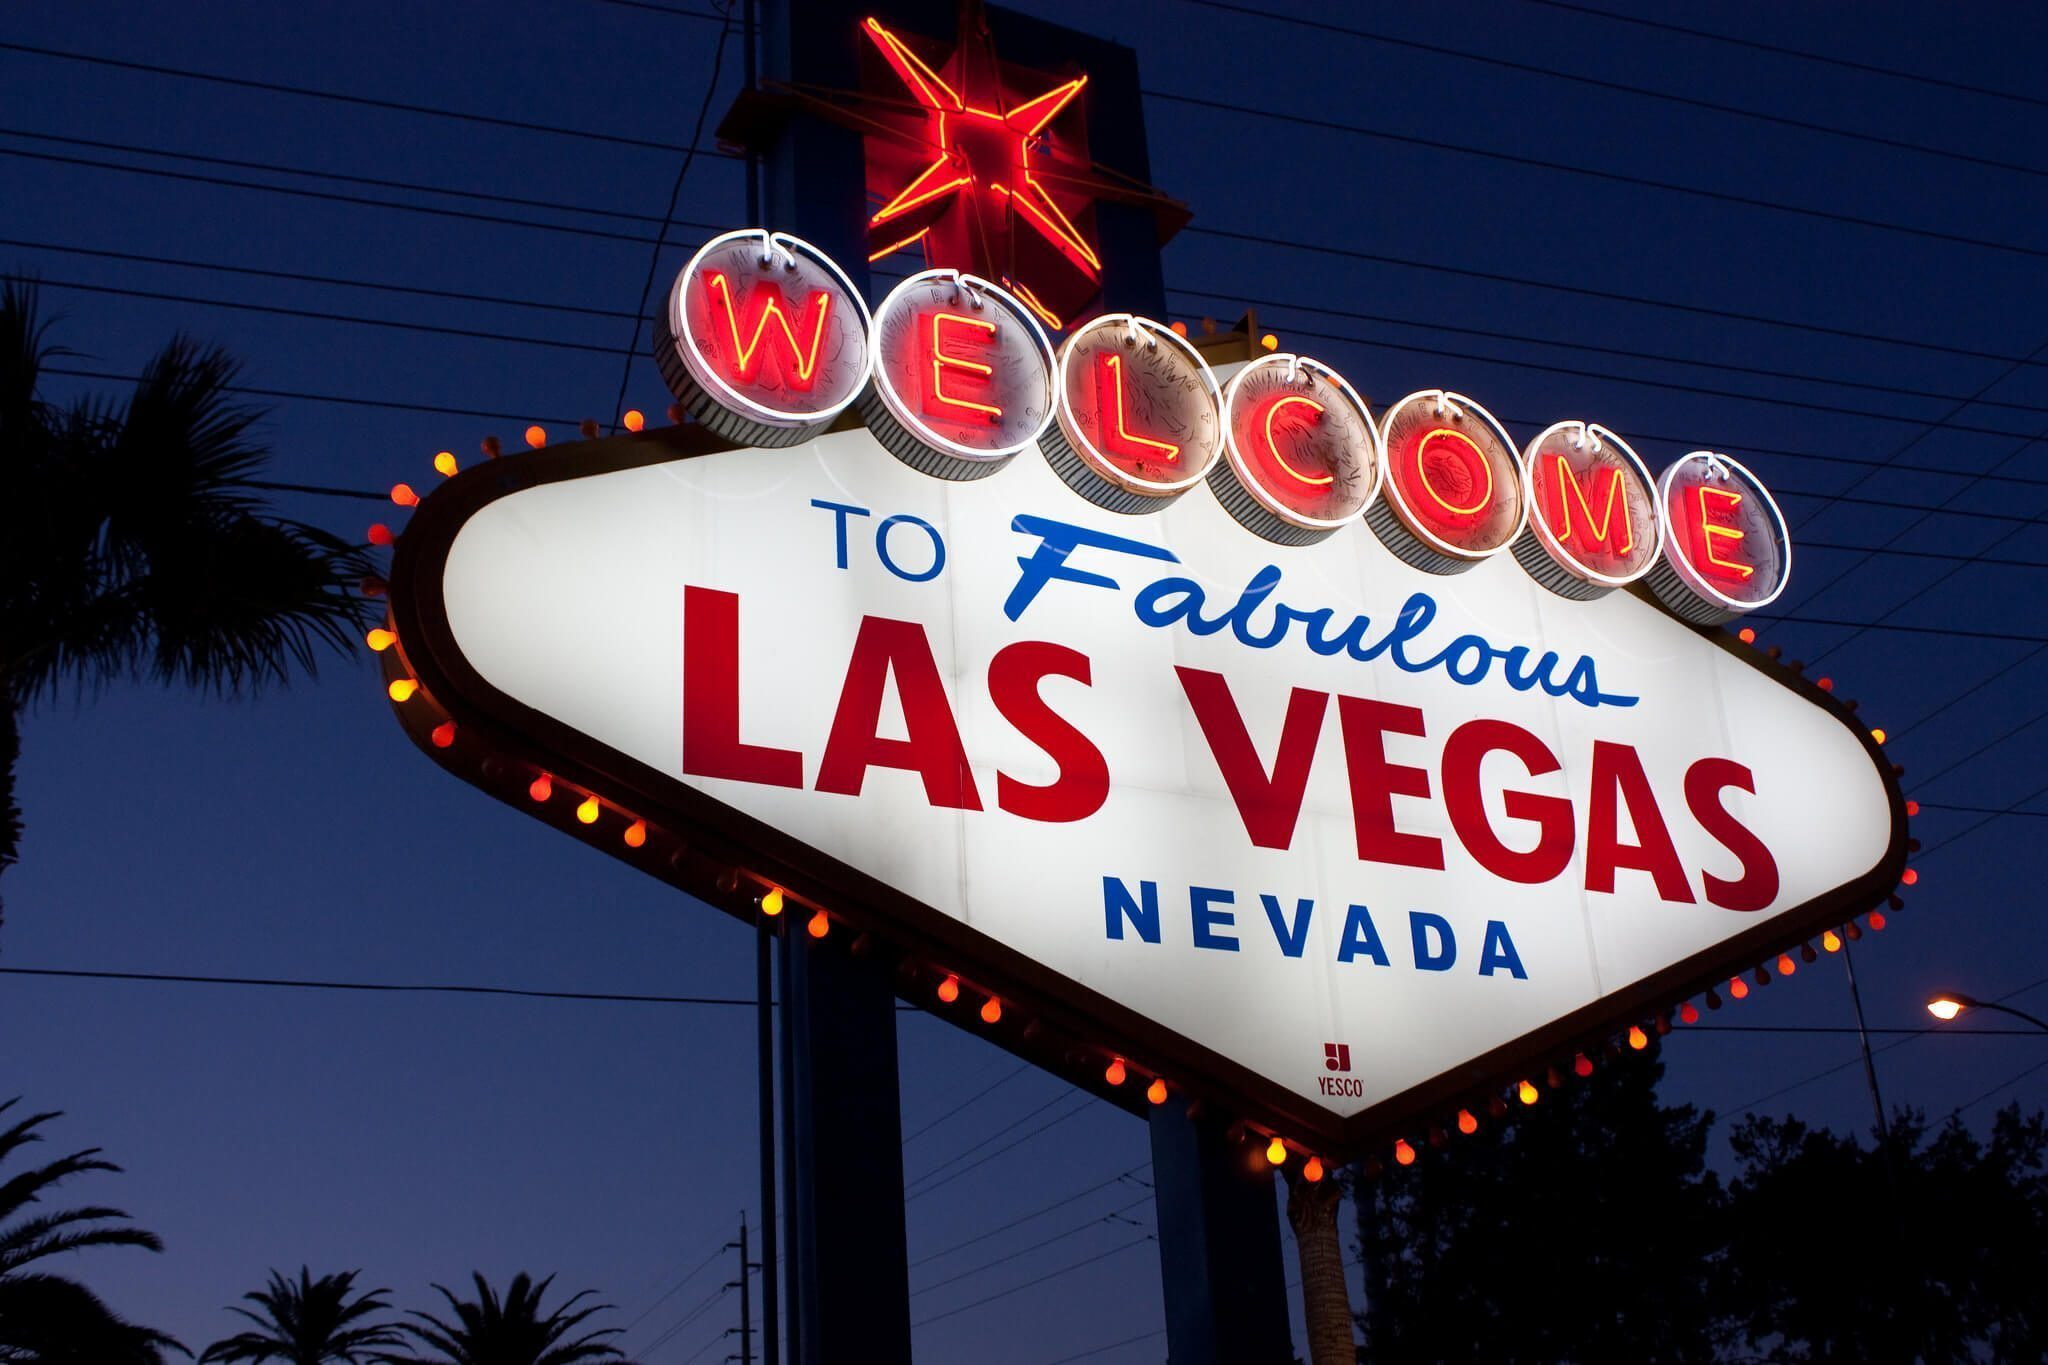 Las Vegas Sign in Las Vegas